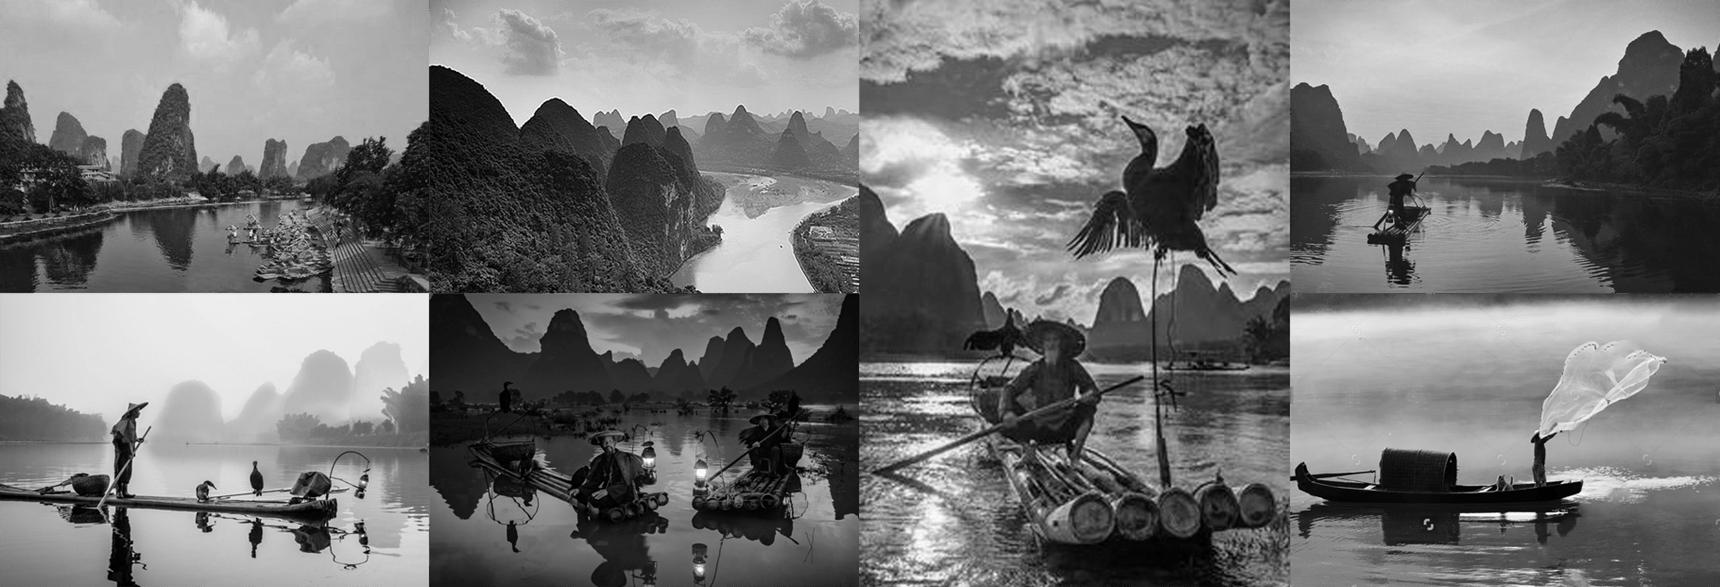 fisherman_ref_landscape